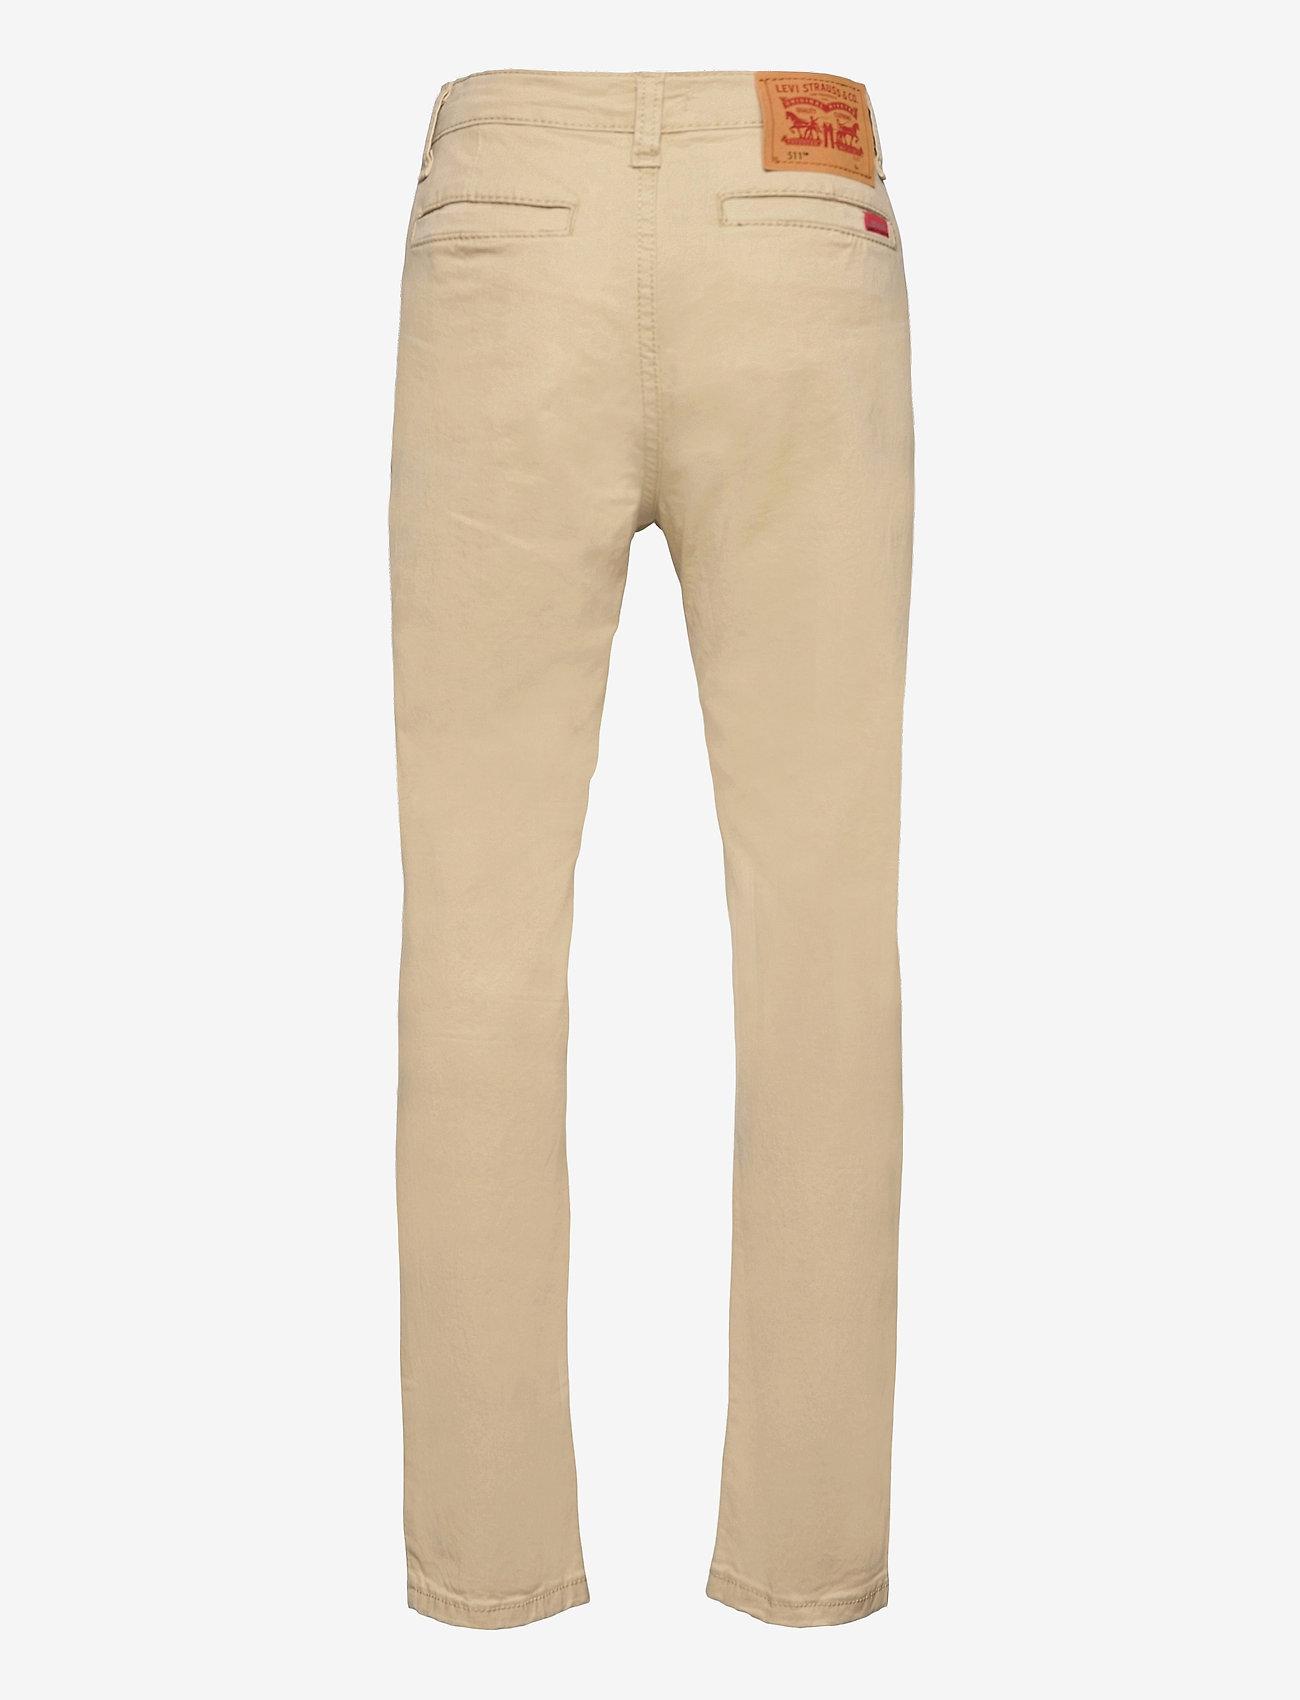 Levi's - LVB 511 SLIM FIT XX CHINOS - trousers - pale khaki - 1